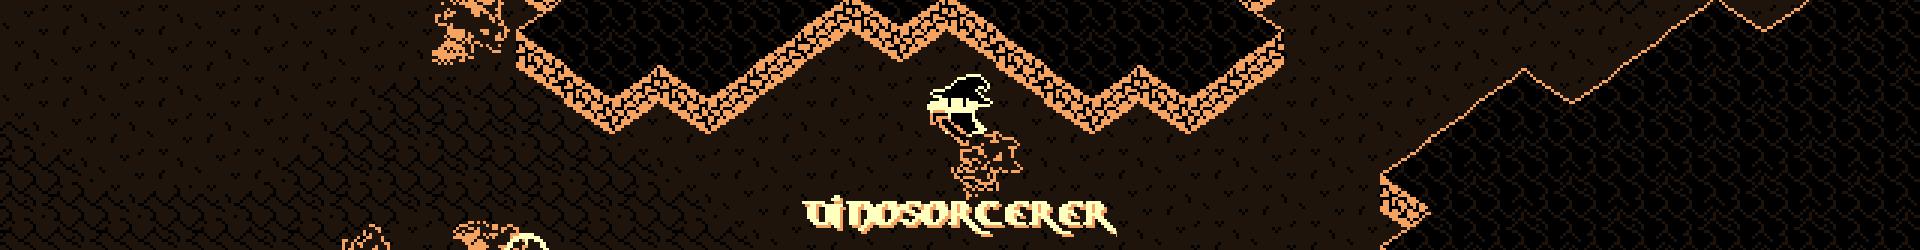 DinoSorcerer - αlpha